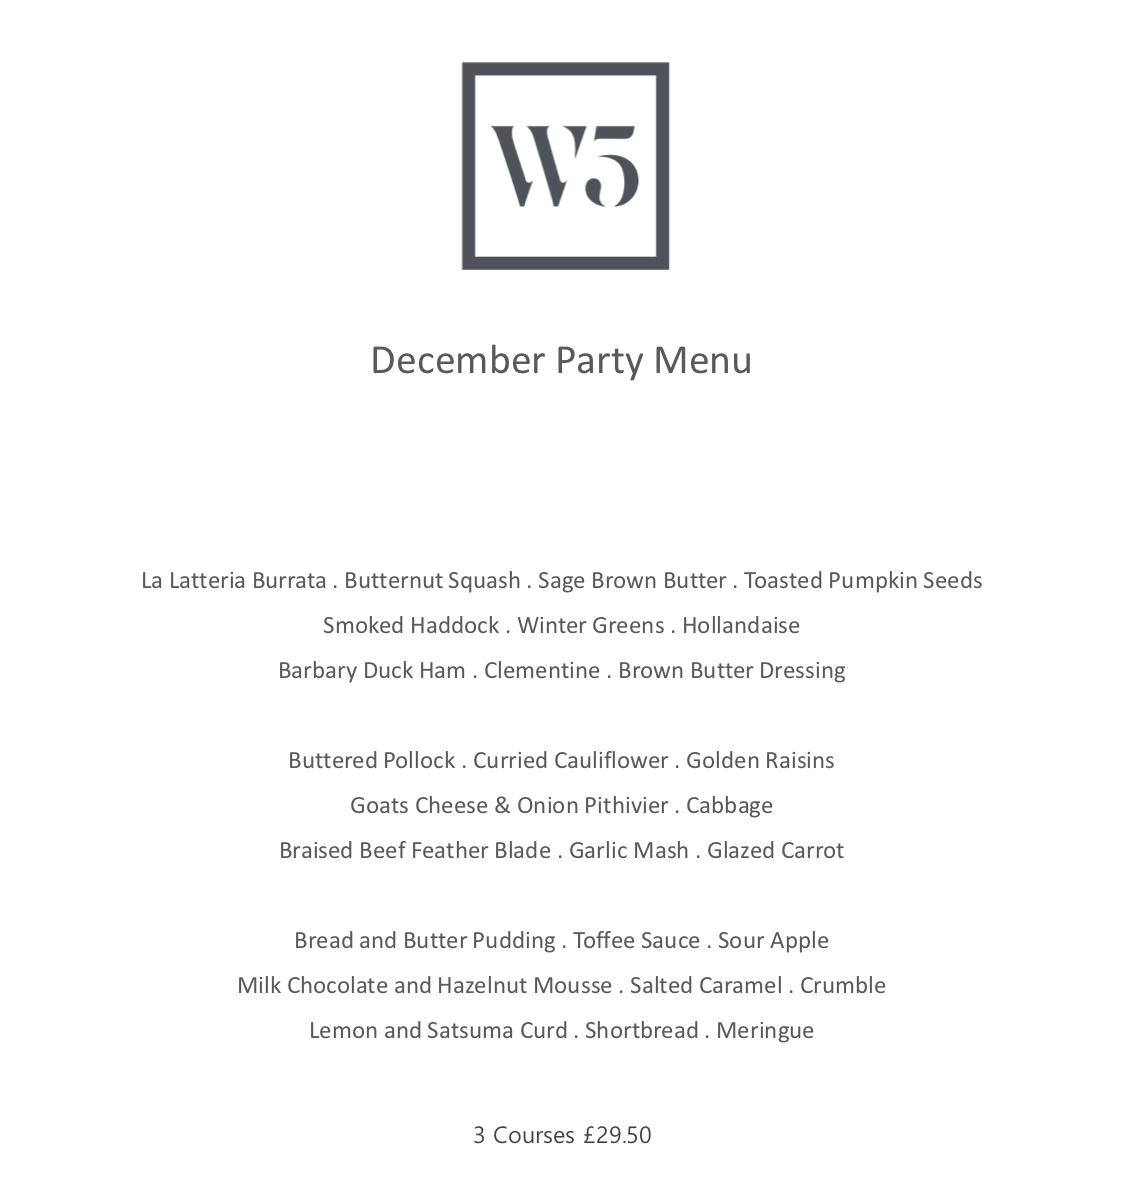 CharlottesW5 December Party Menu 2018.jpg